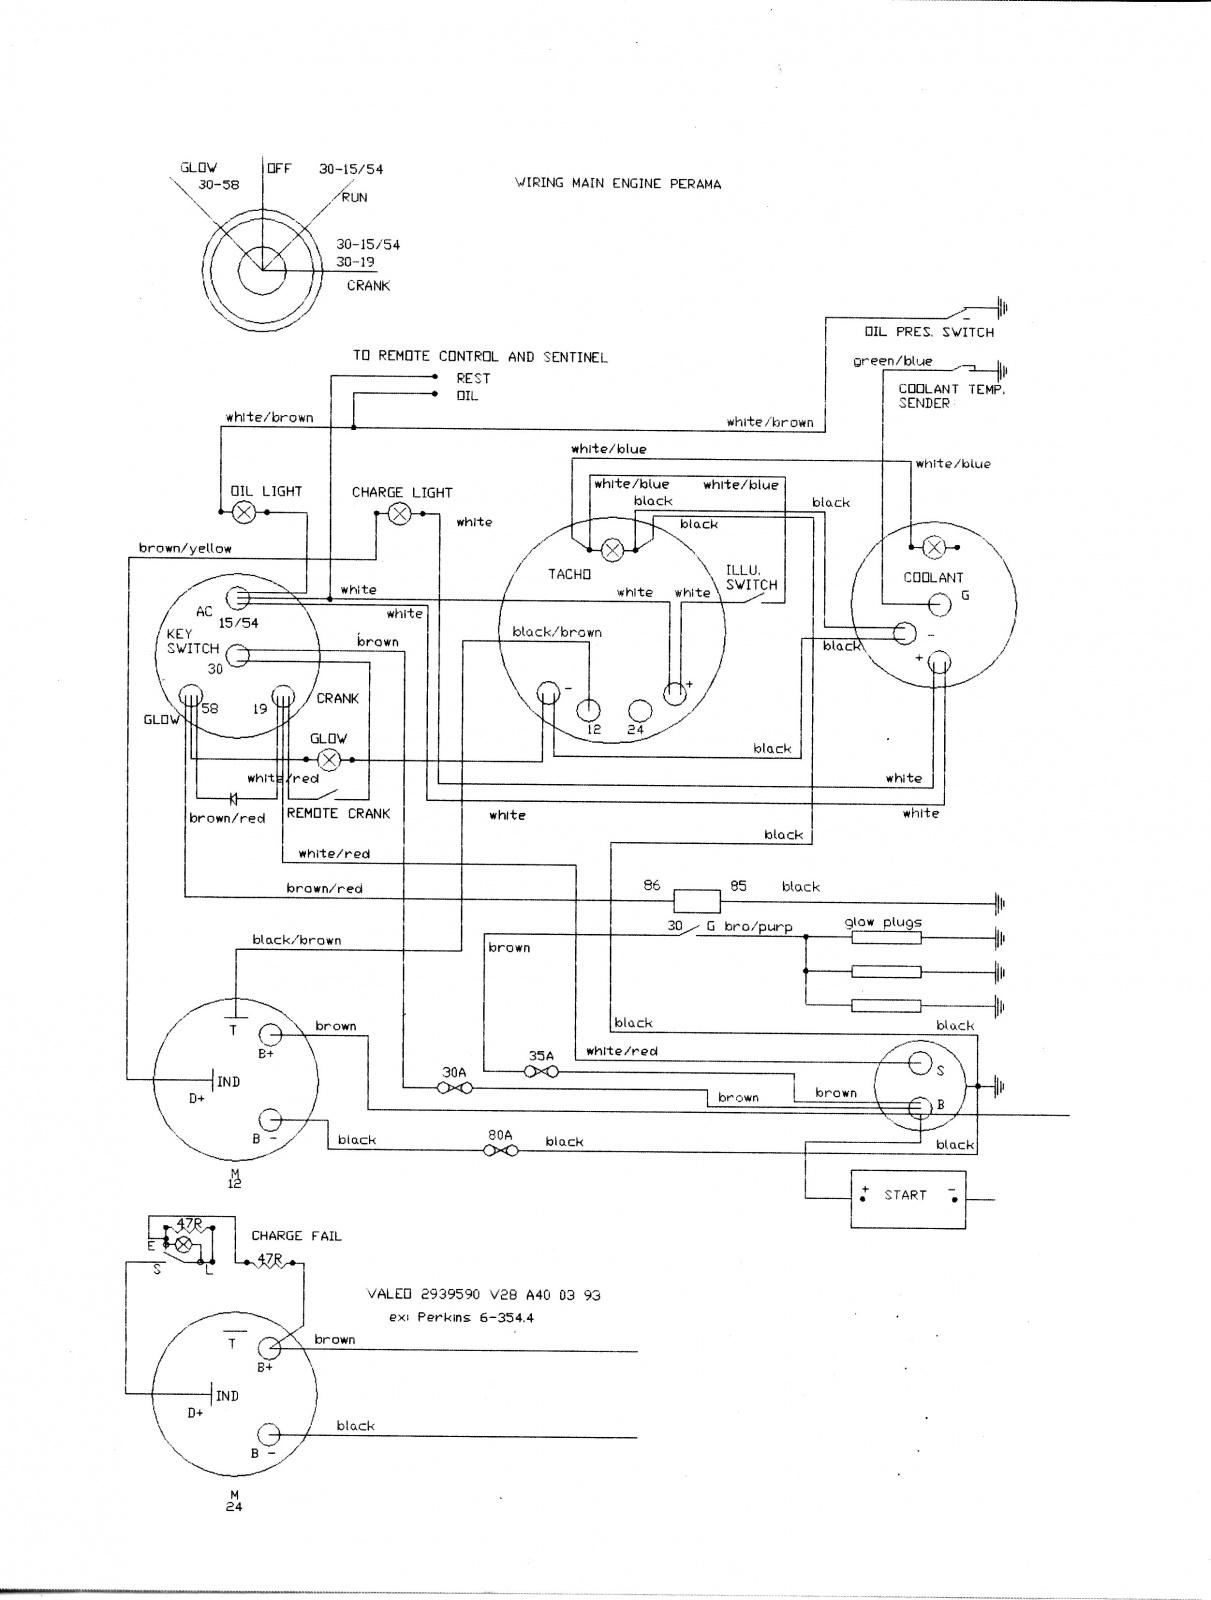 Click image for larger version  Name:mainwiring.jpg Views:109 Size:332.9 KB ID:7621